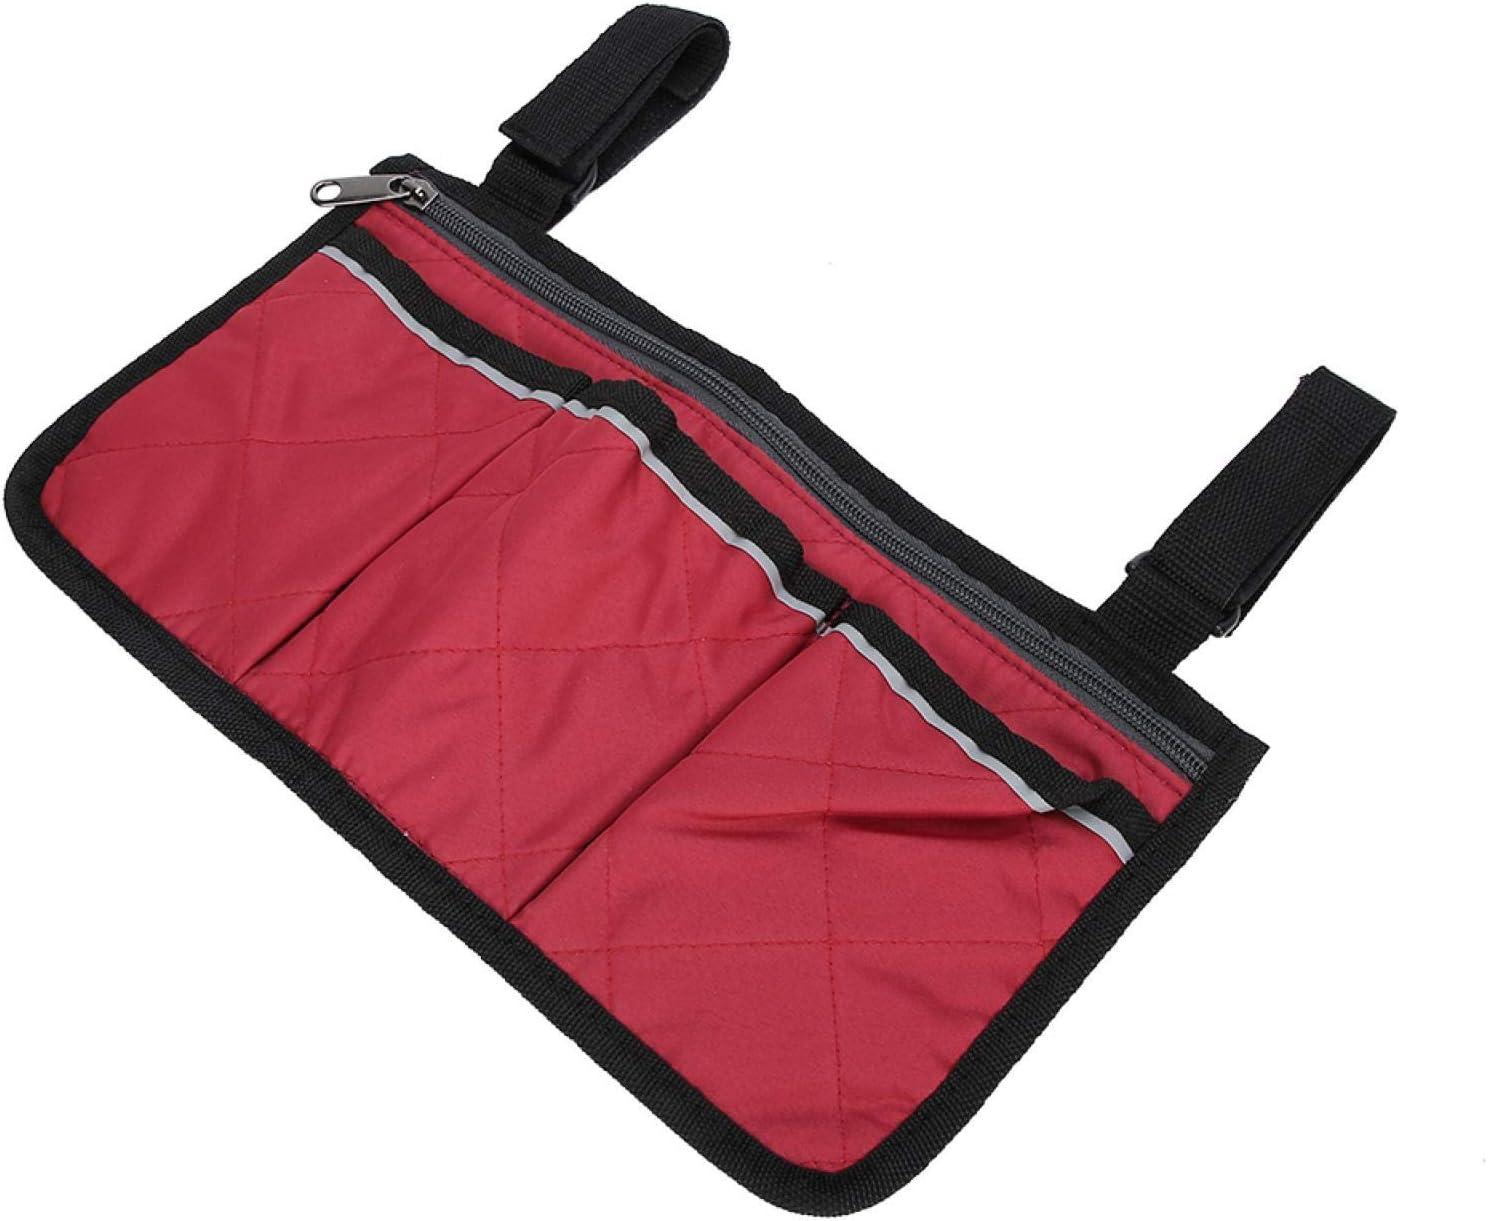 Wheelchair Bag Max 64% OFF Durable Max 69% OFF Convenient Pouch 1 Practical